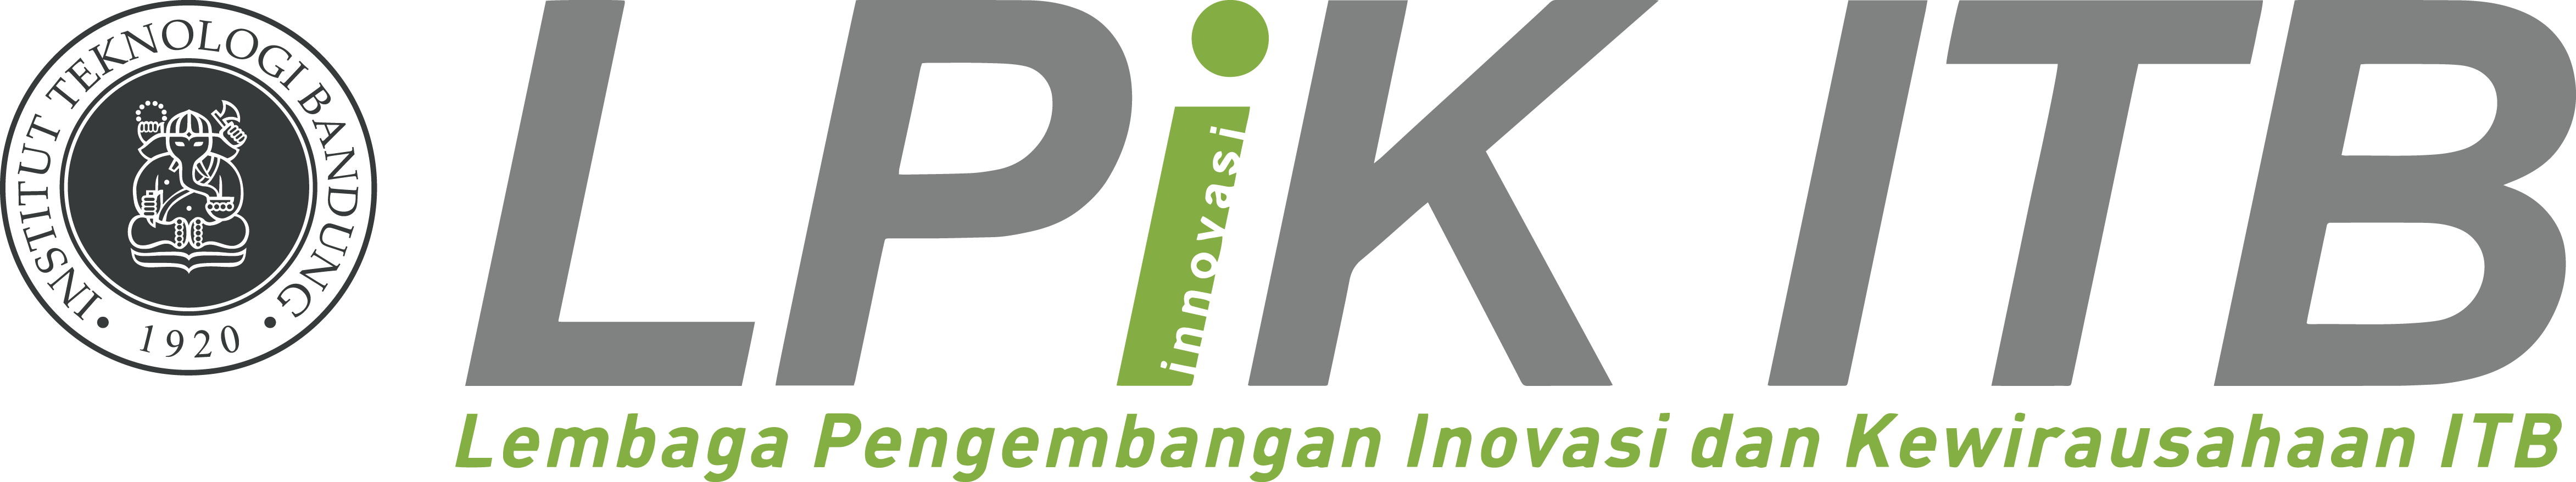 [Call For Proposal]  Program Penguatan Inovas...